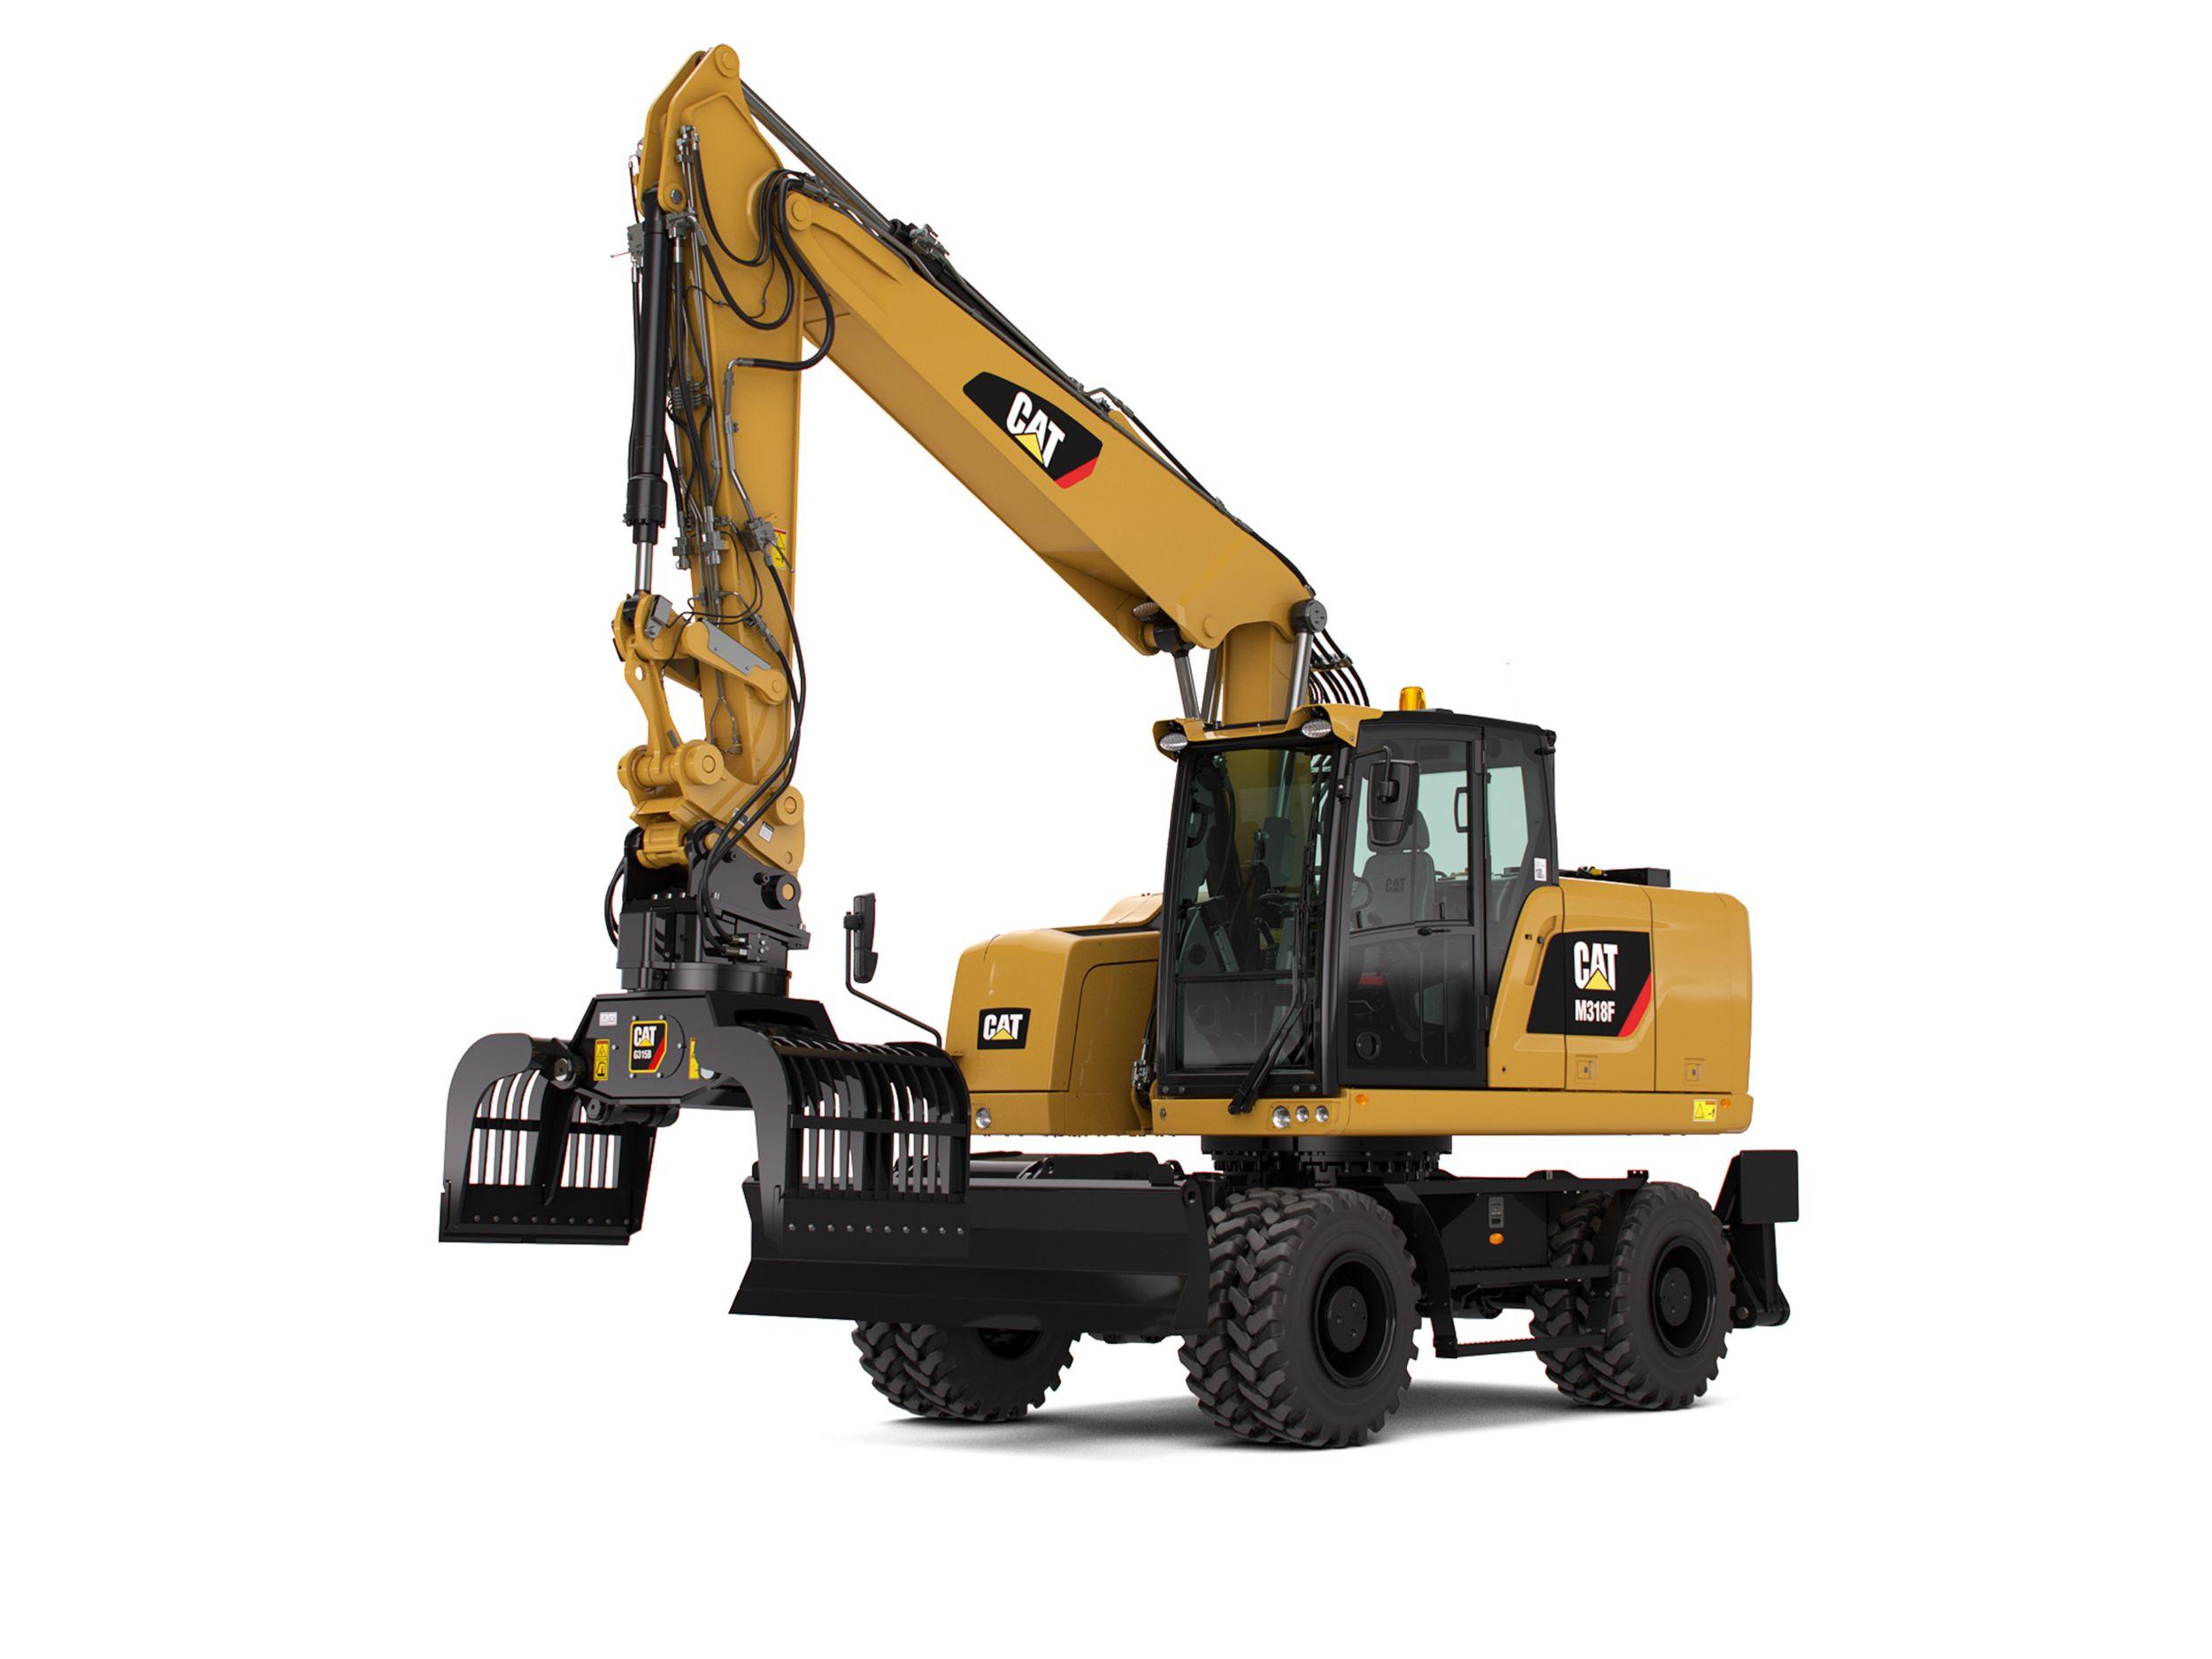 M318F Wheeled Excavator